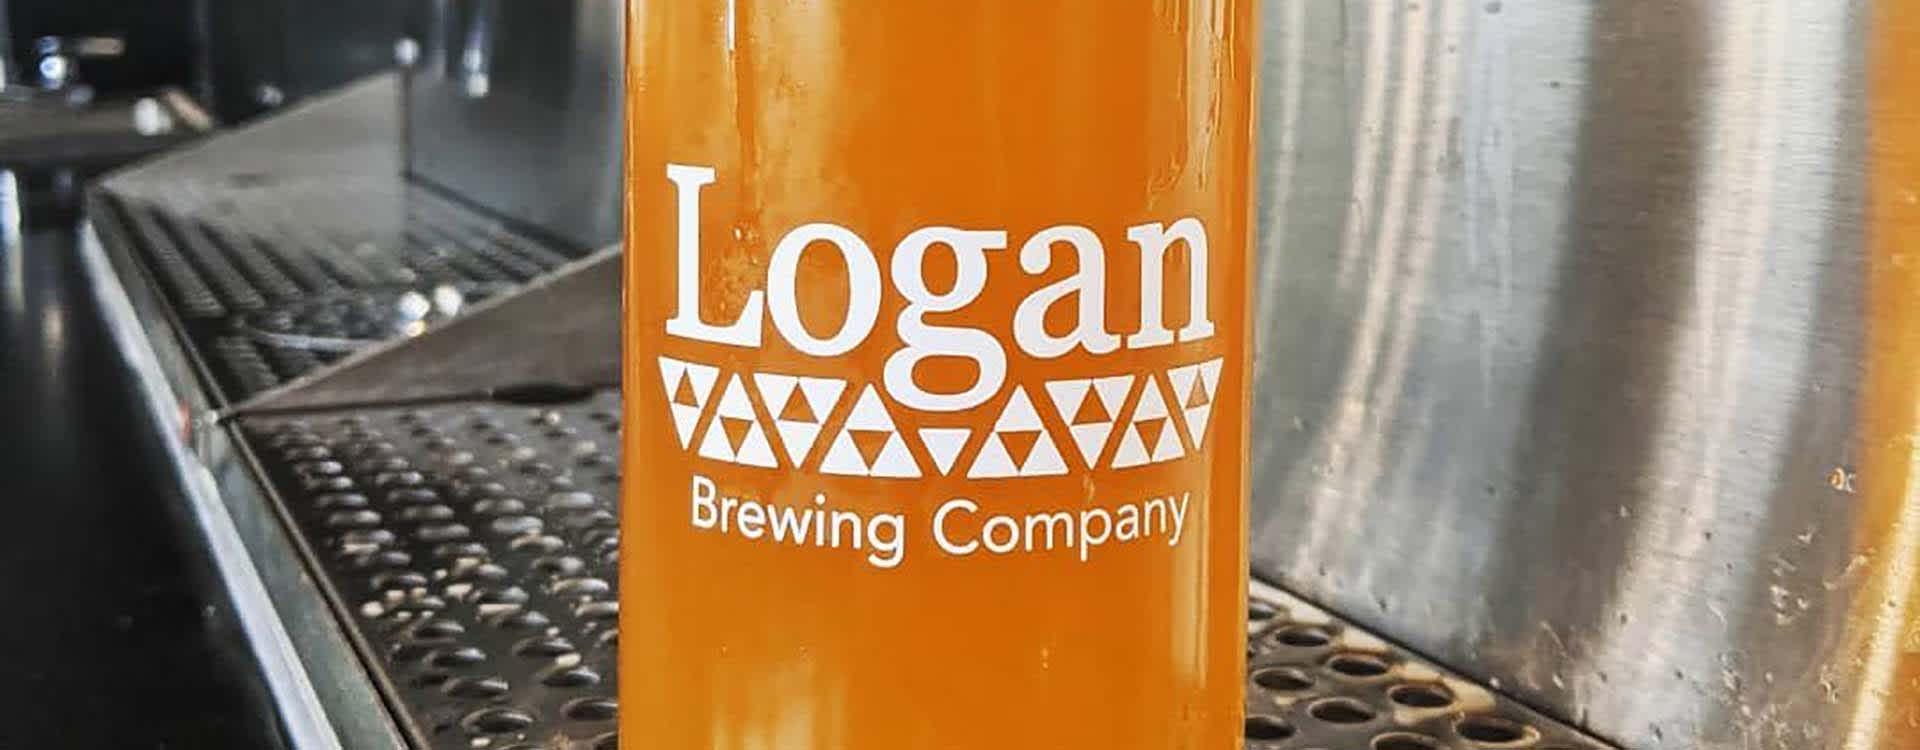 Logan Brewing Company in Burien Washington